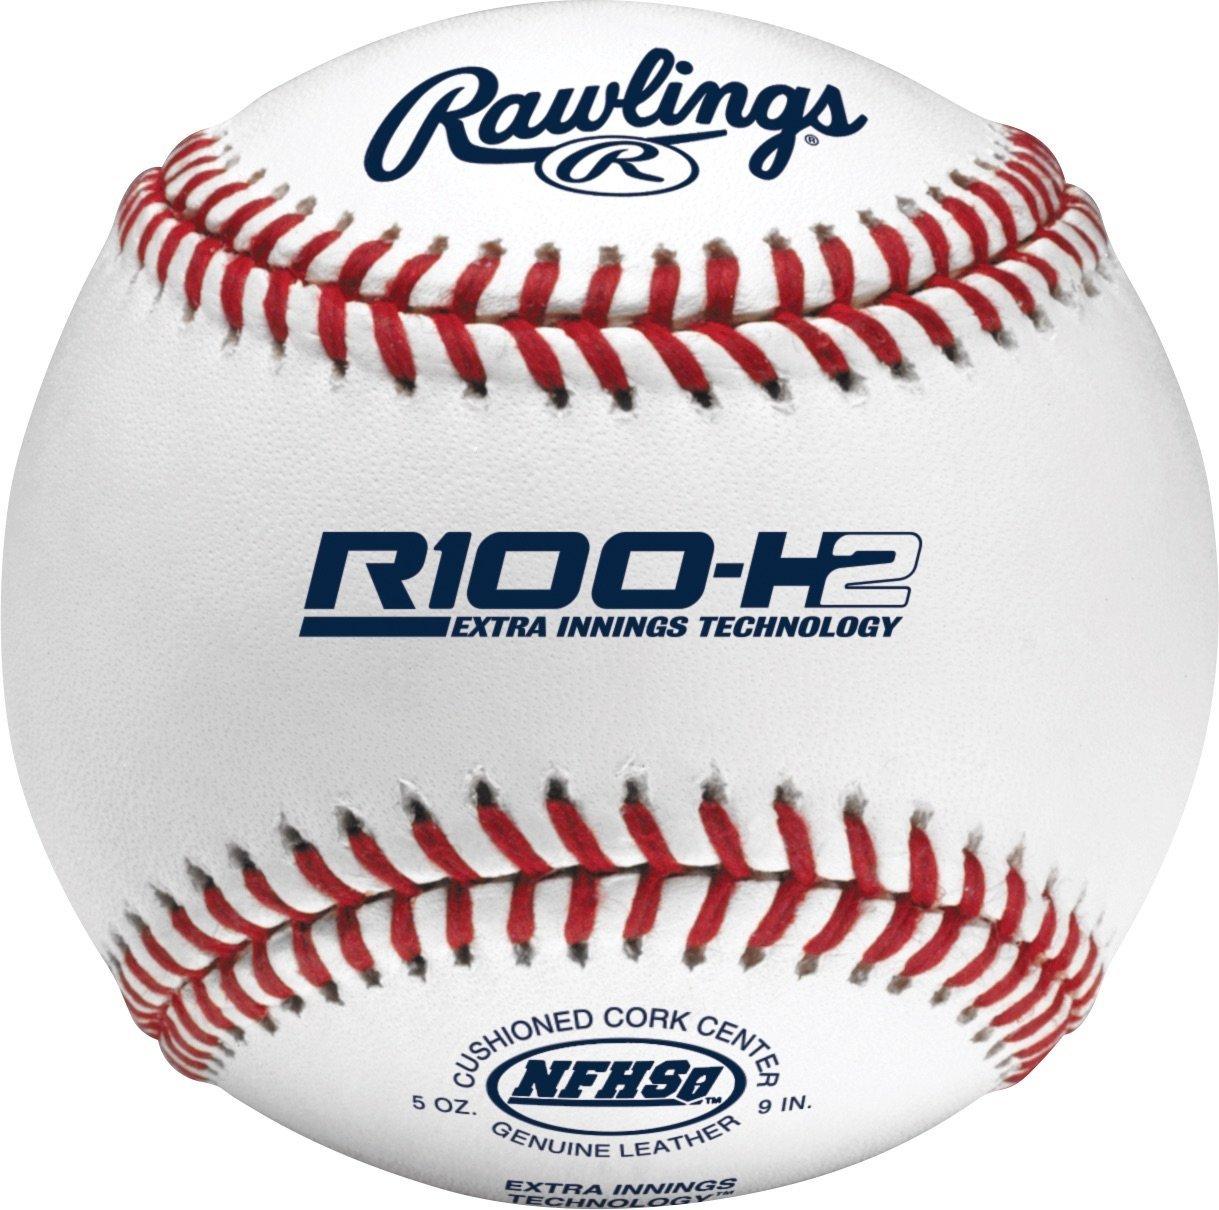 Rawlings Raised Seams Official NFHS High School Baseballs, 12 Count, R100-H2